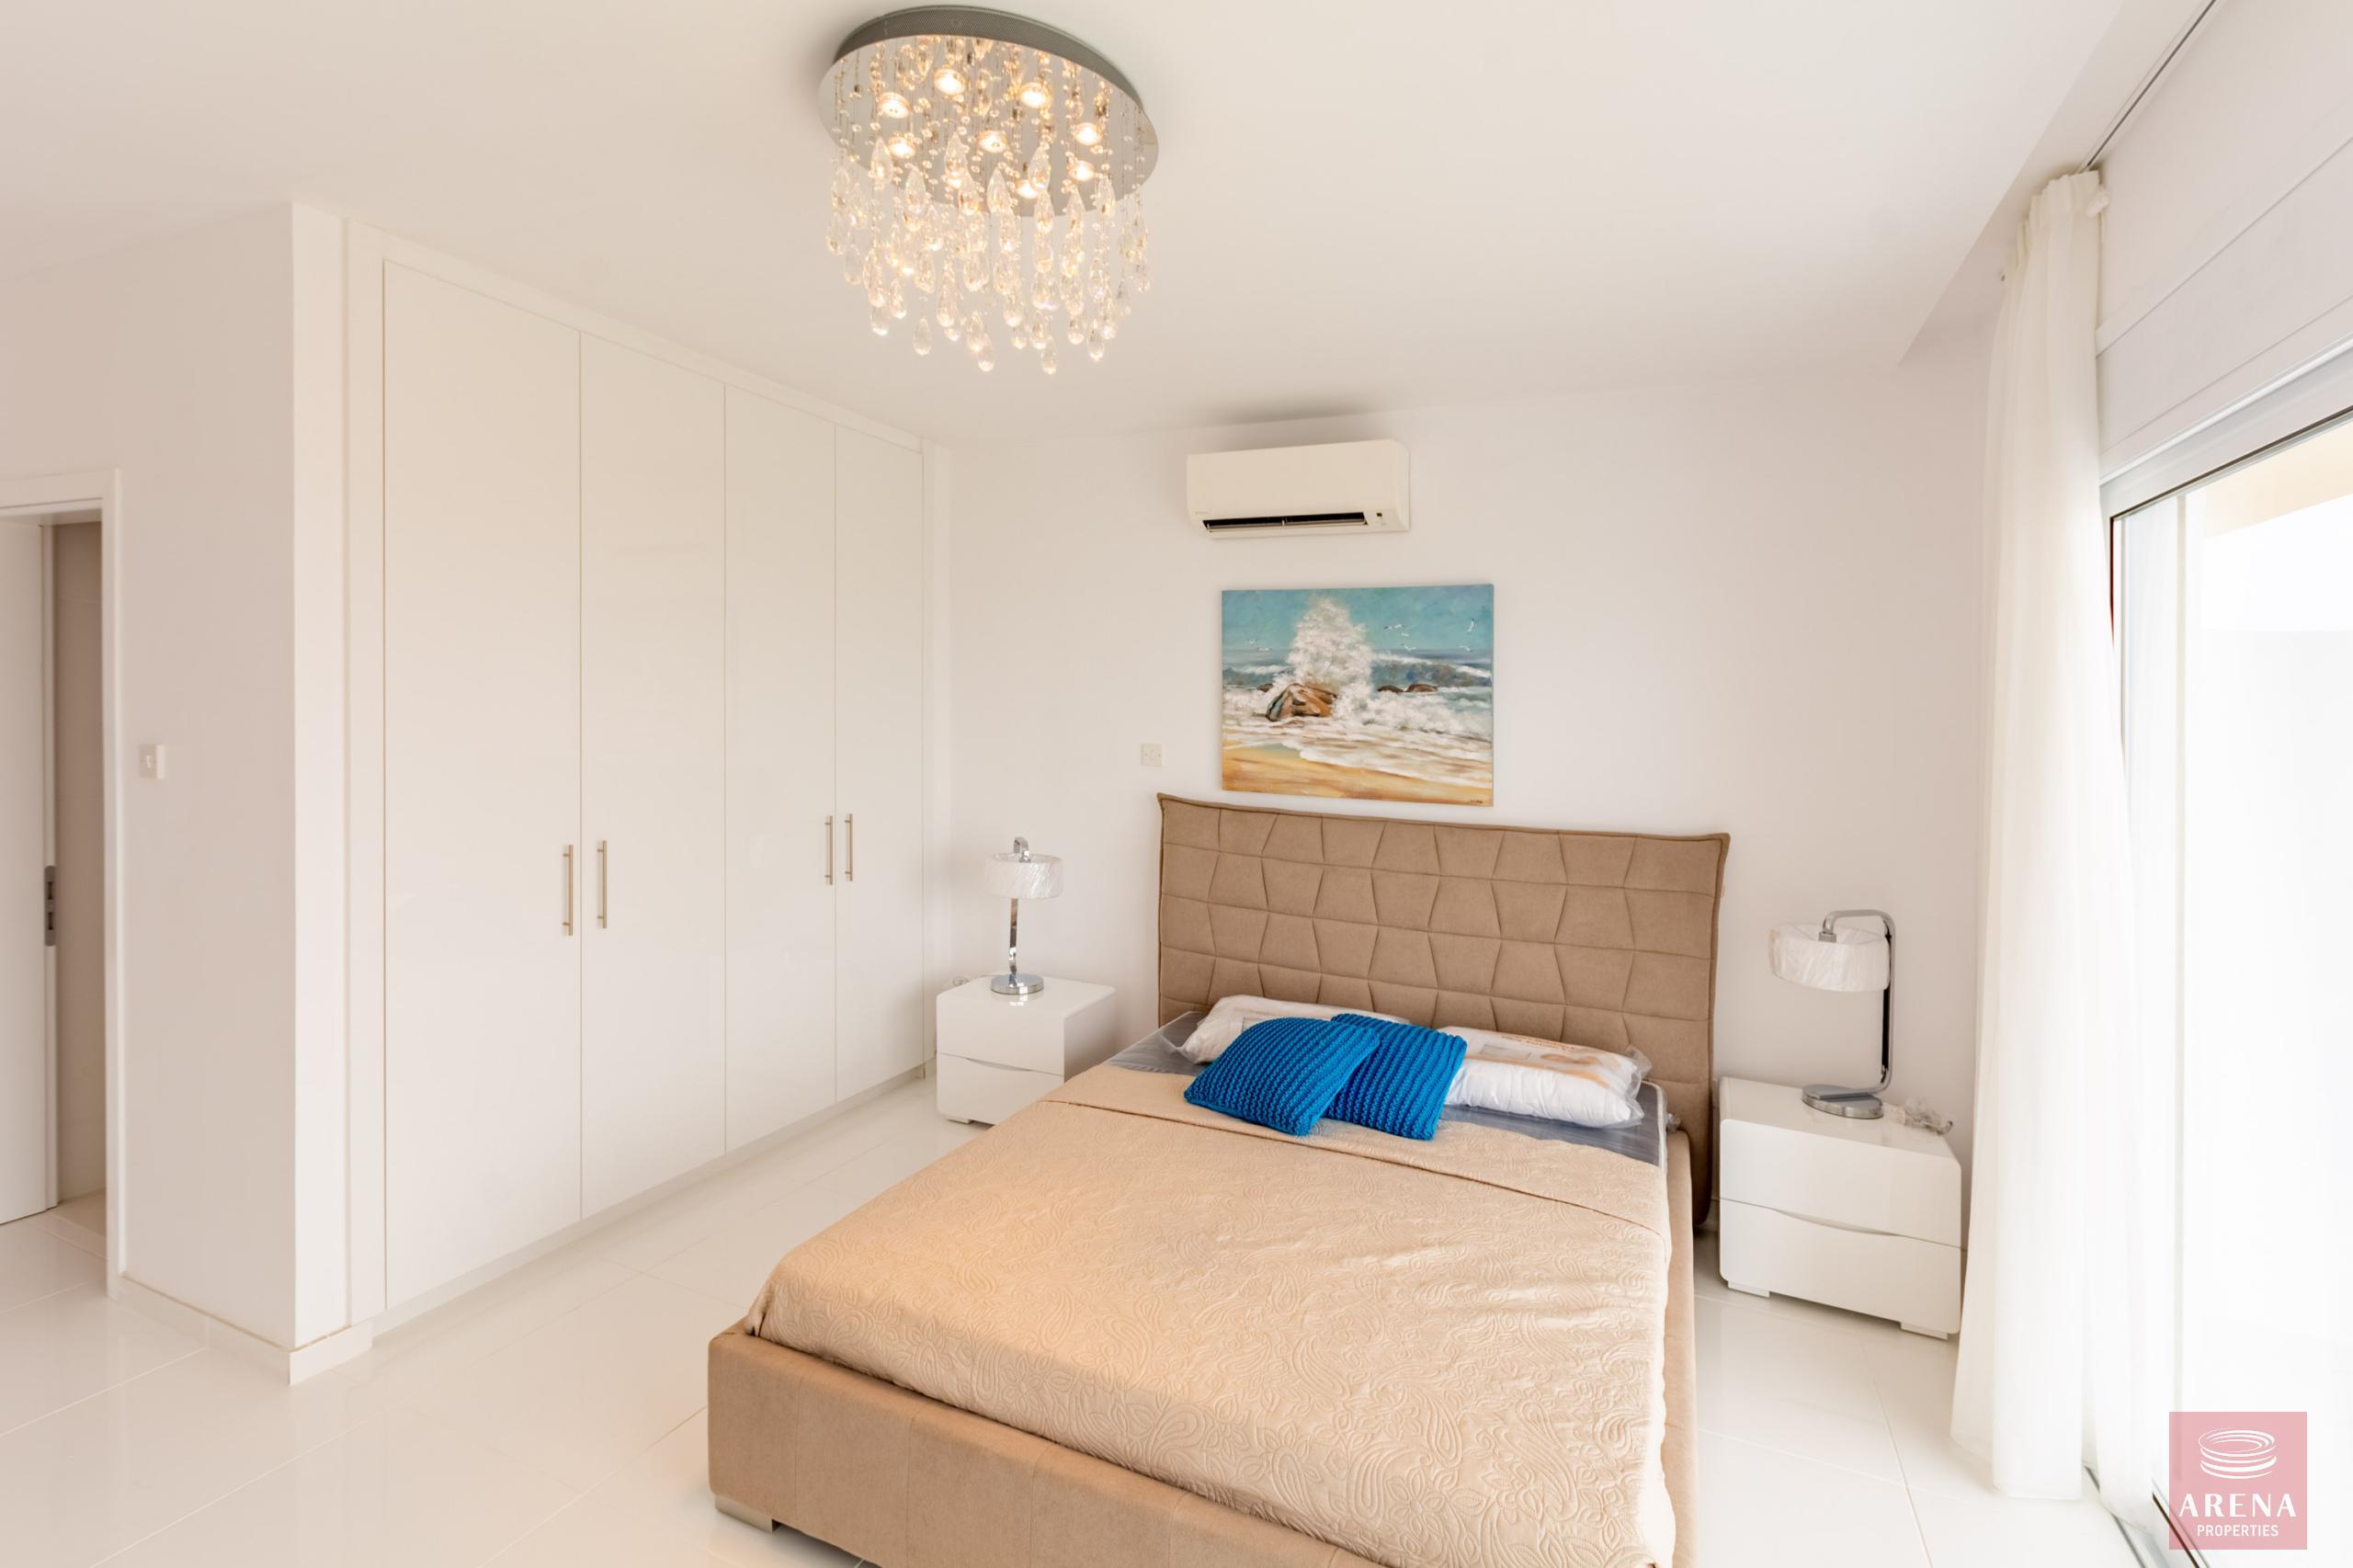 Apartment in Ayia Triada to buy - bedroom